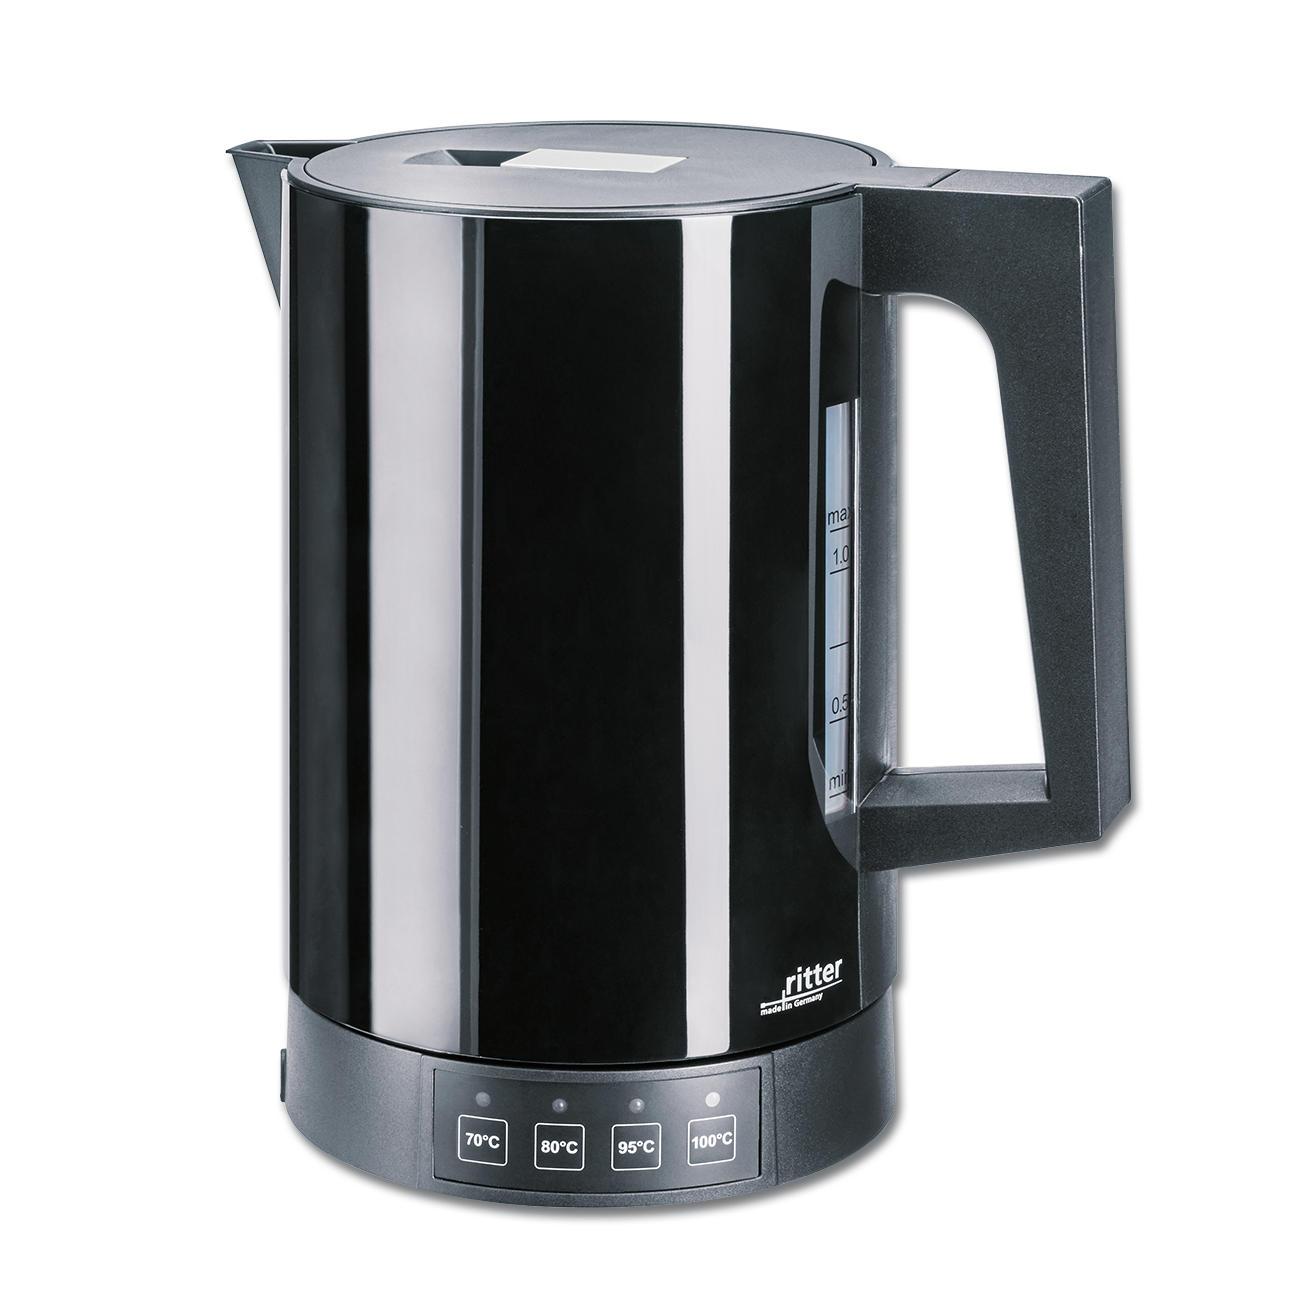 Ritter toaster volcano 5 3 jahre garantie pro idee - Wasserkocher made in germany ...